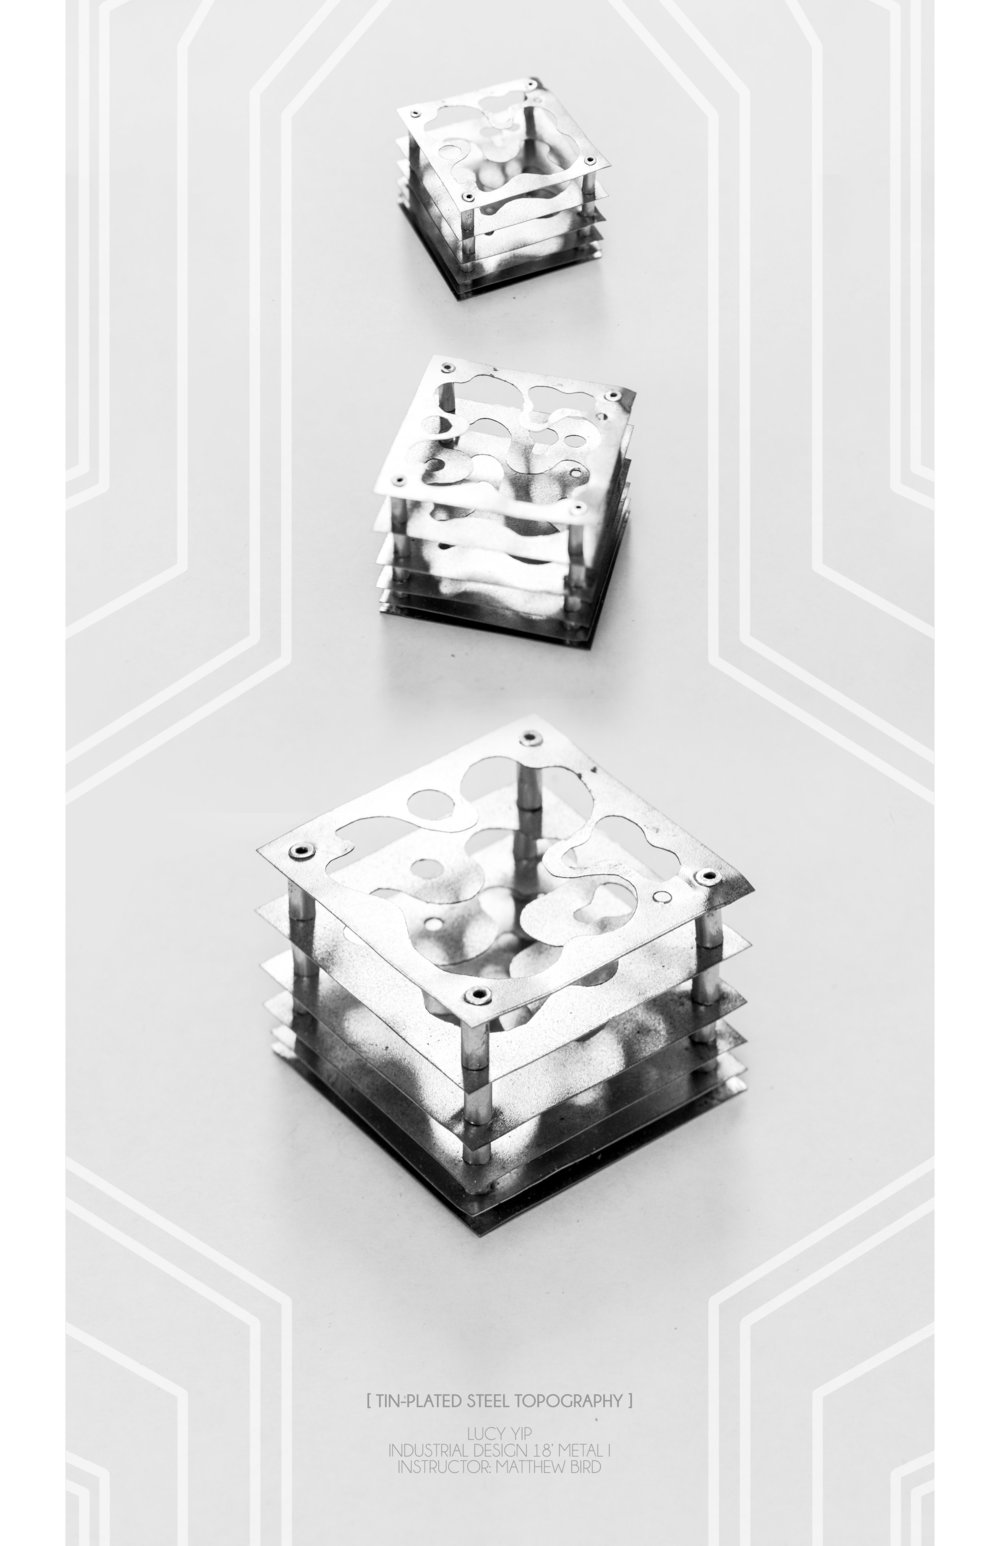 2015FA.Metal+1.Tin-Plated+Steel+Topography.Yip_Lucy.jpg